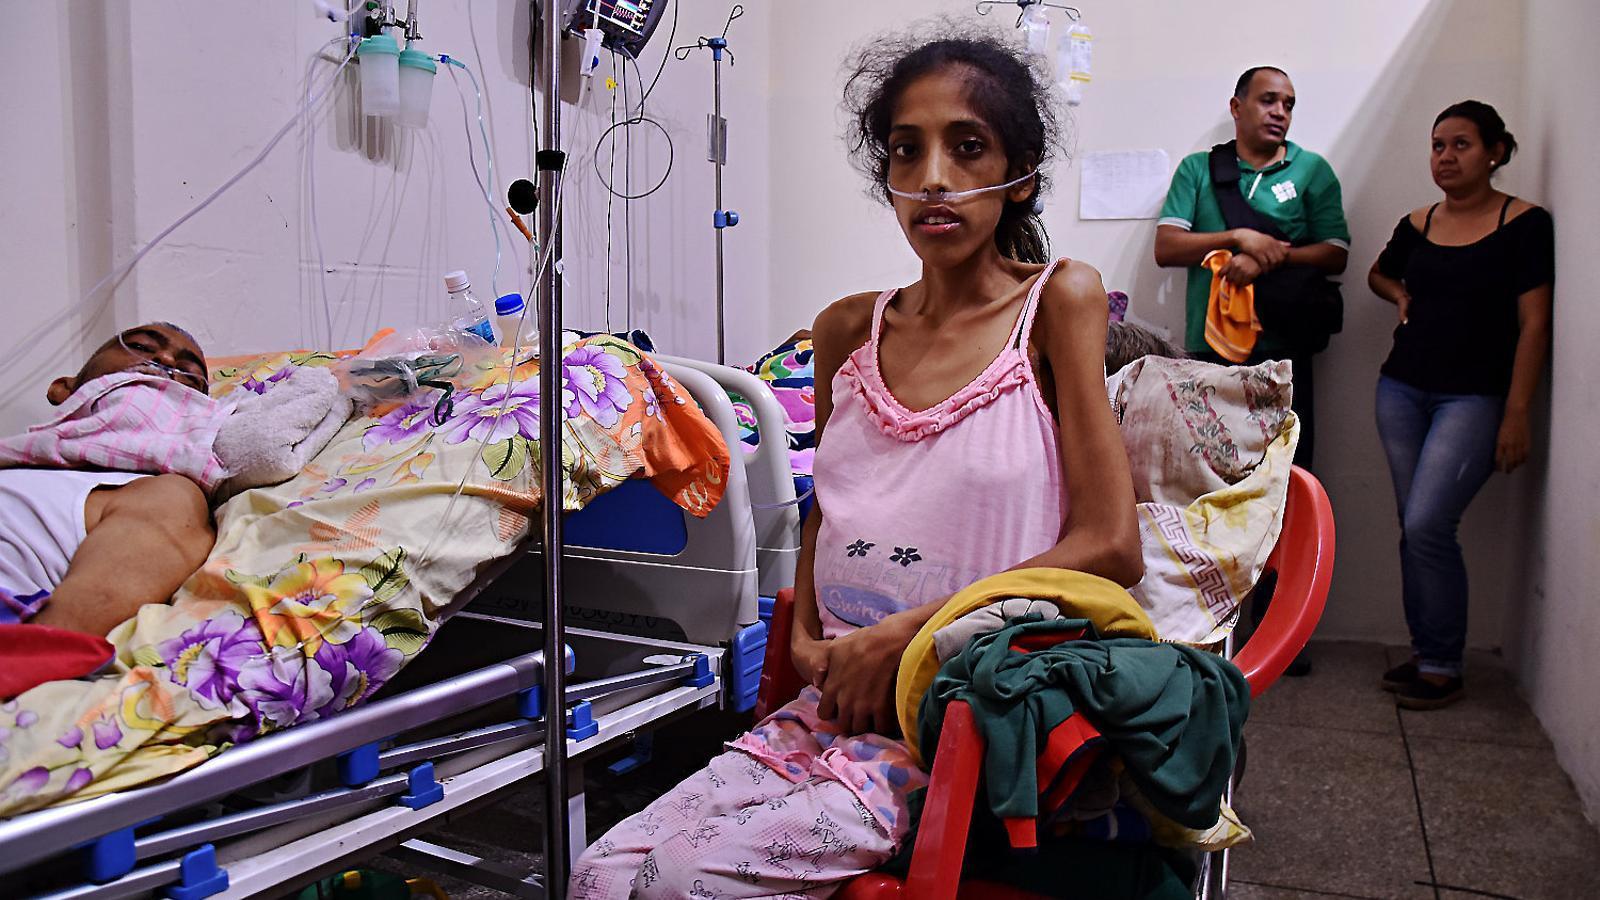 Hospitals sense aigua, lavabos ni medecines